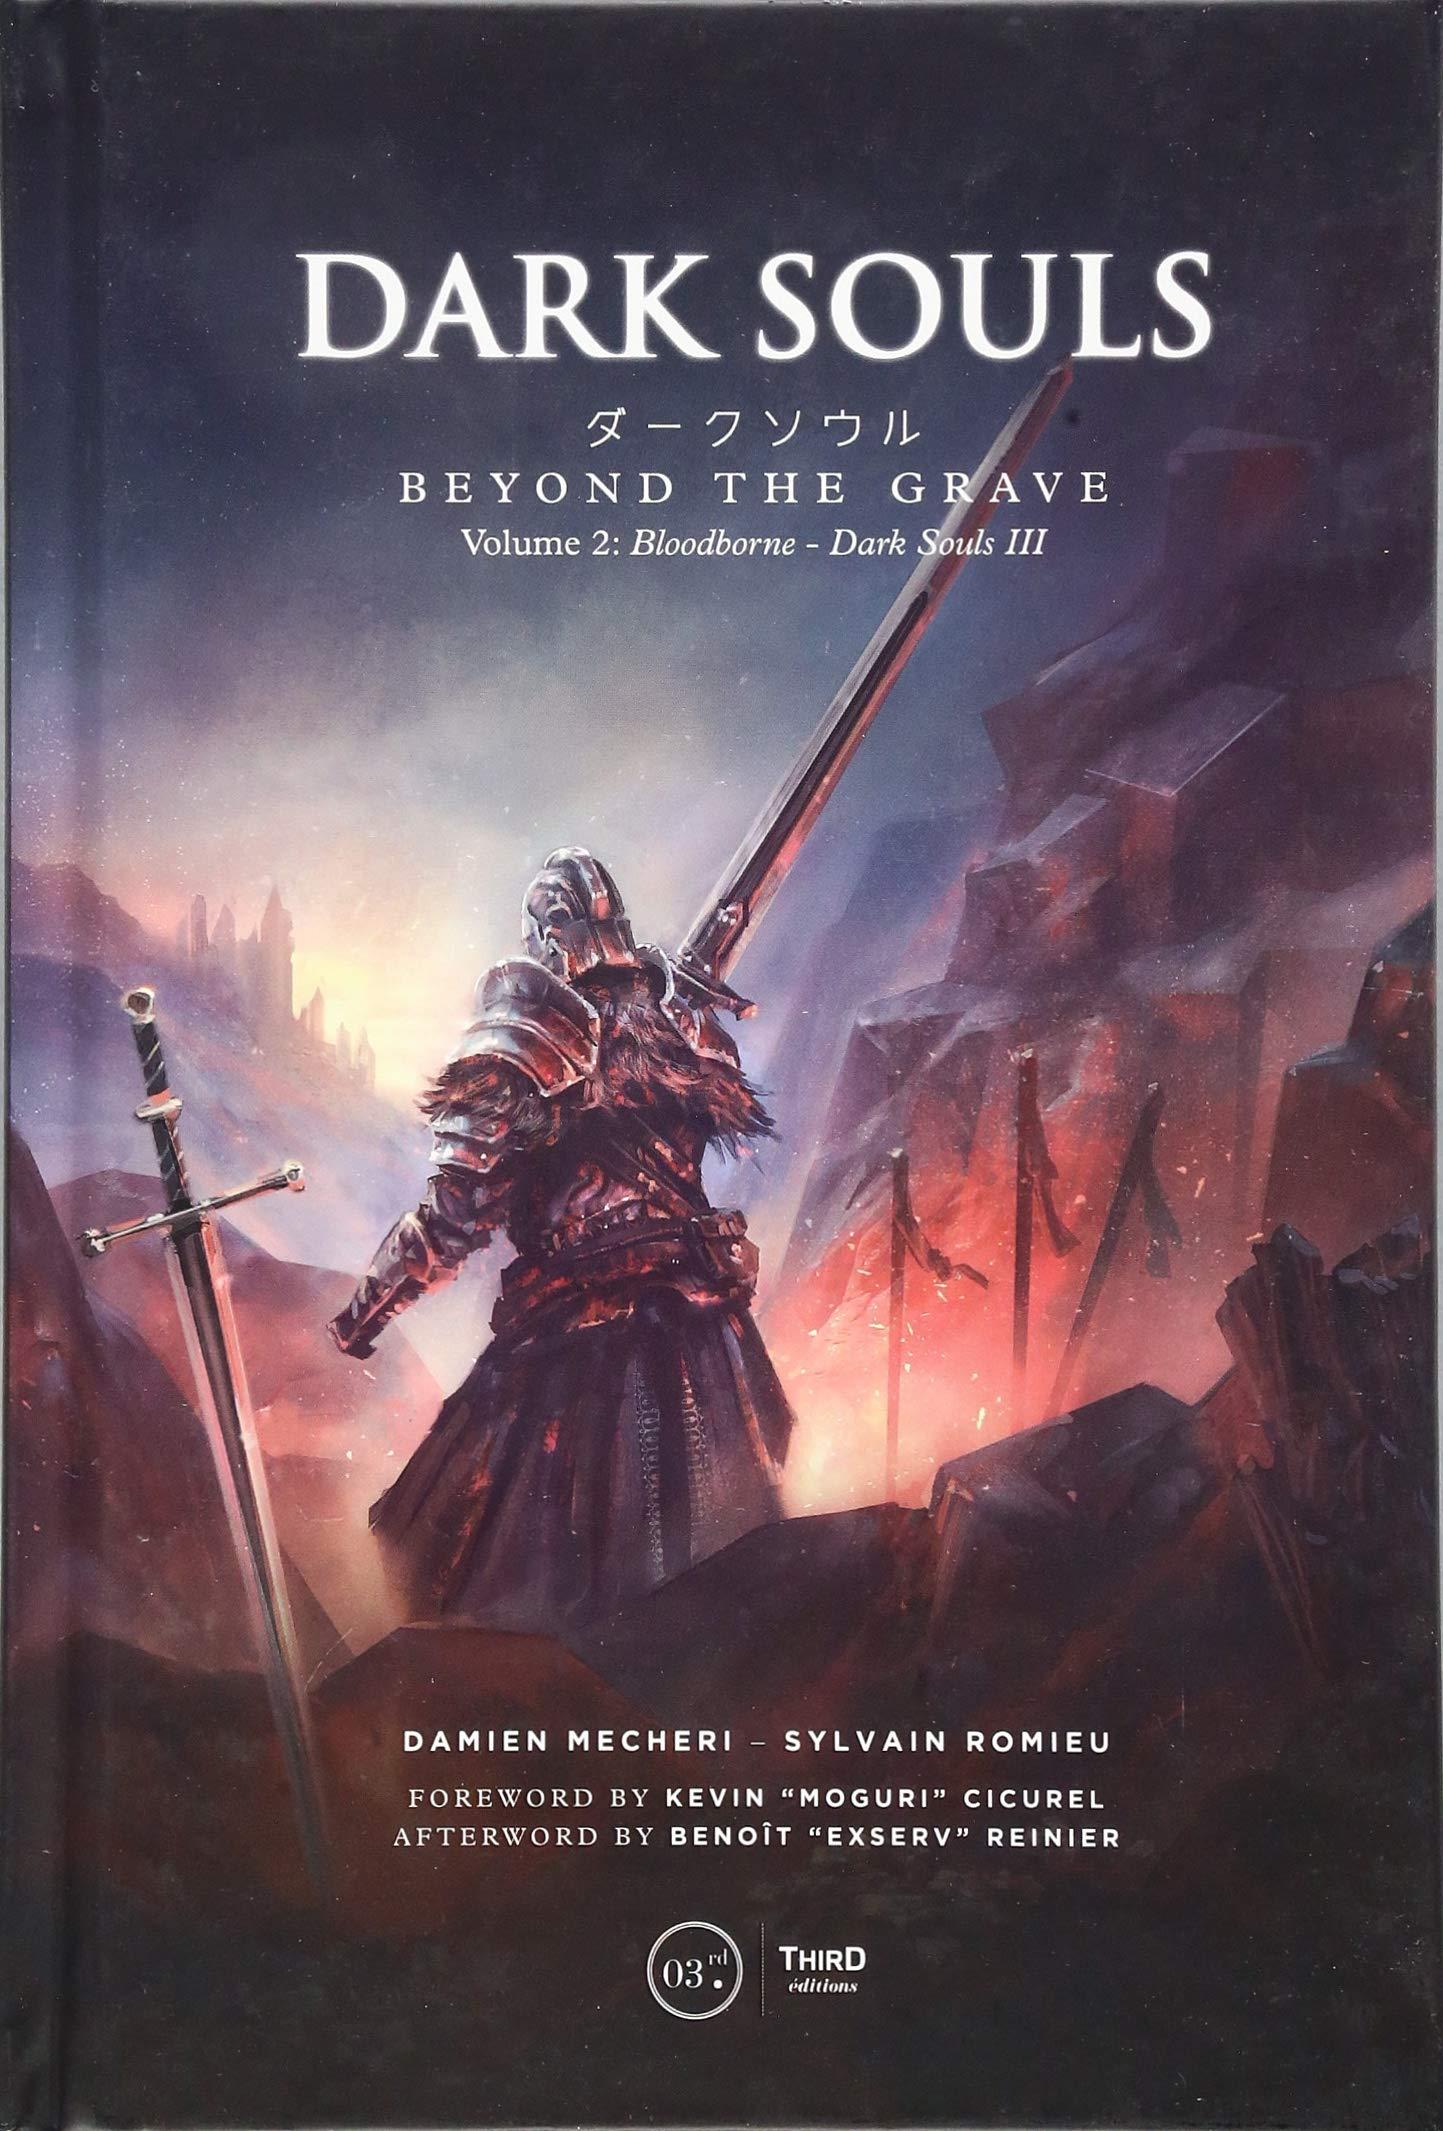 Dark Souls: Beyond The Grave - Volume 2: Amazon.es: Precigout, Val (c)rie, Romieu, Sylvain, El Kanafi, Mehdi: Libros en idiomas extranjeros